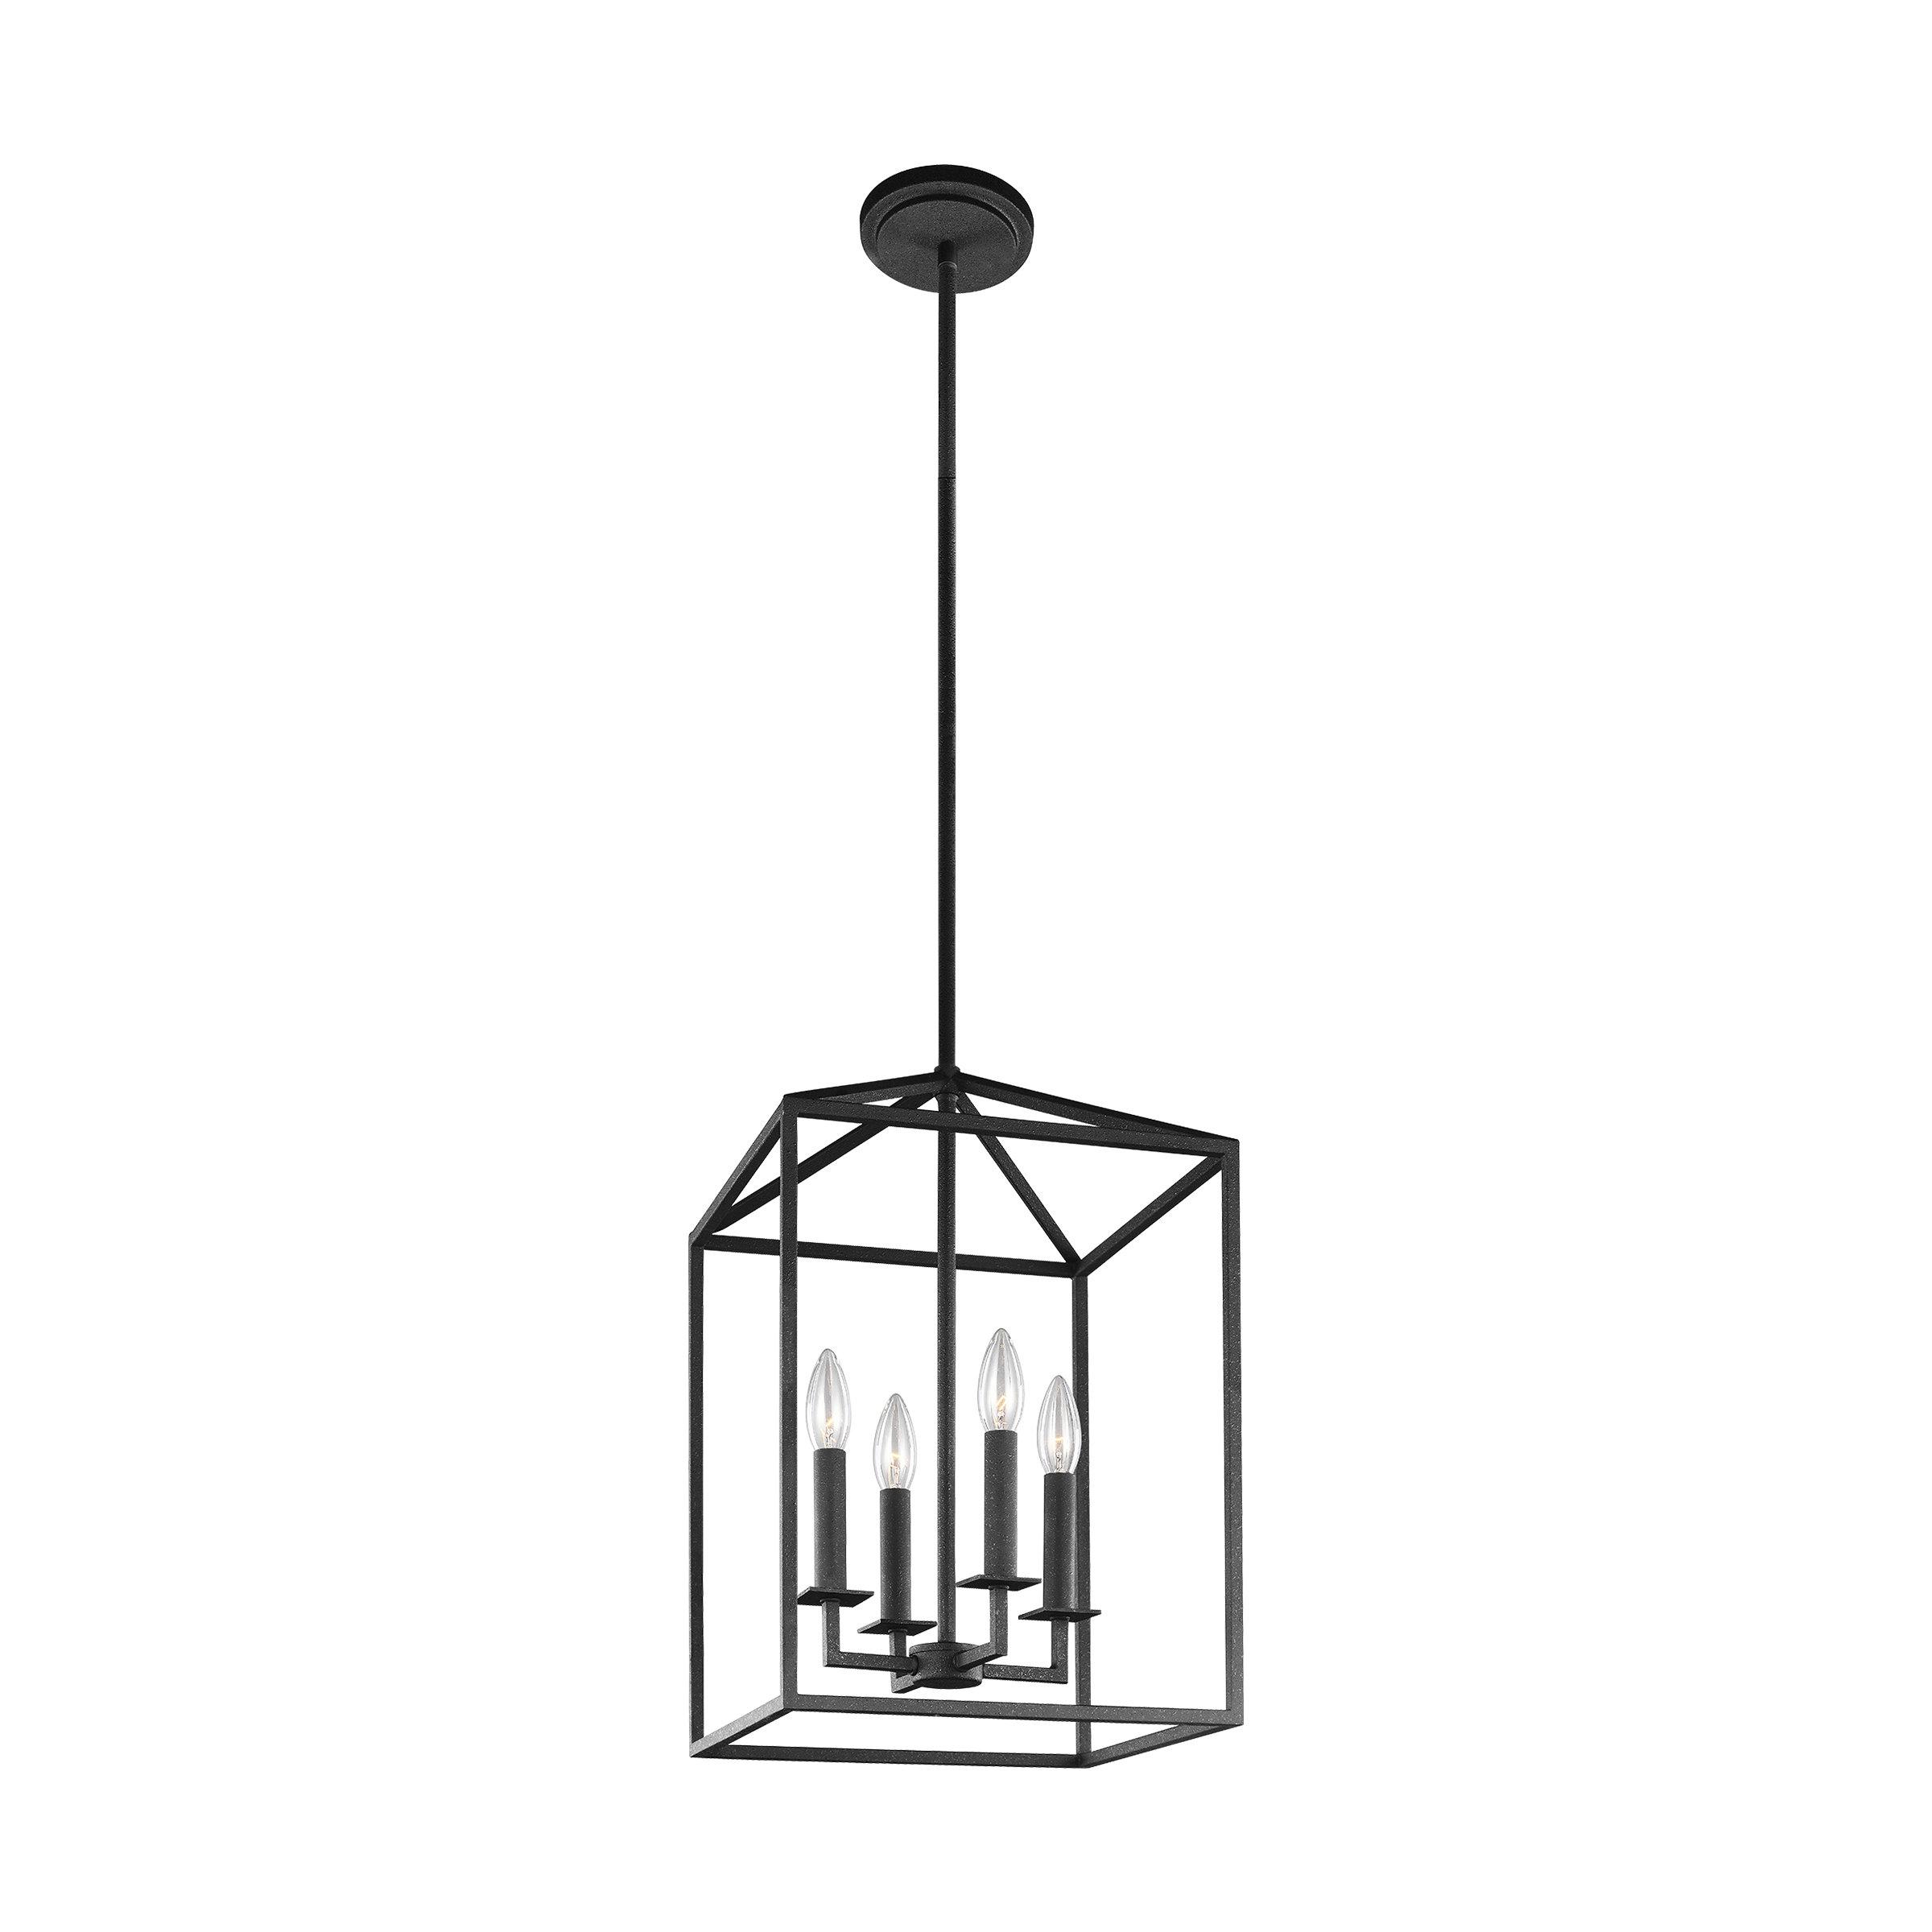 Odie 4 Light Lantern Square / Rectangle Pendant Intended For Odie 8 Light Kitchen Island Square / Rectangle Pendants (View 16 of 30)